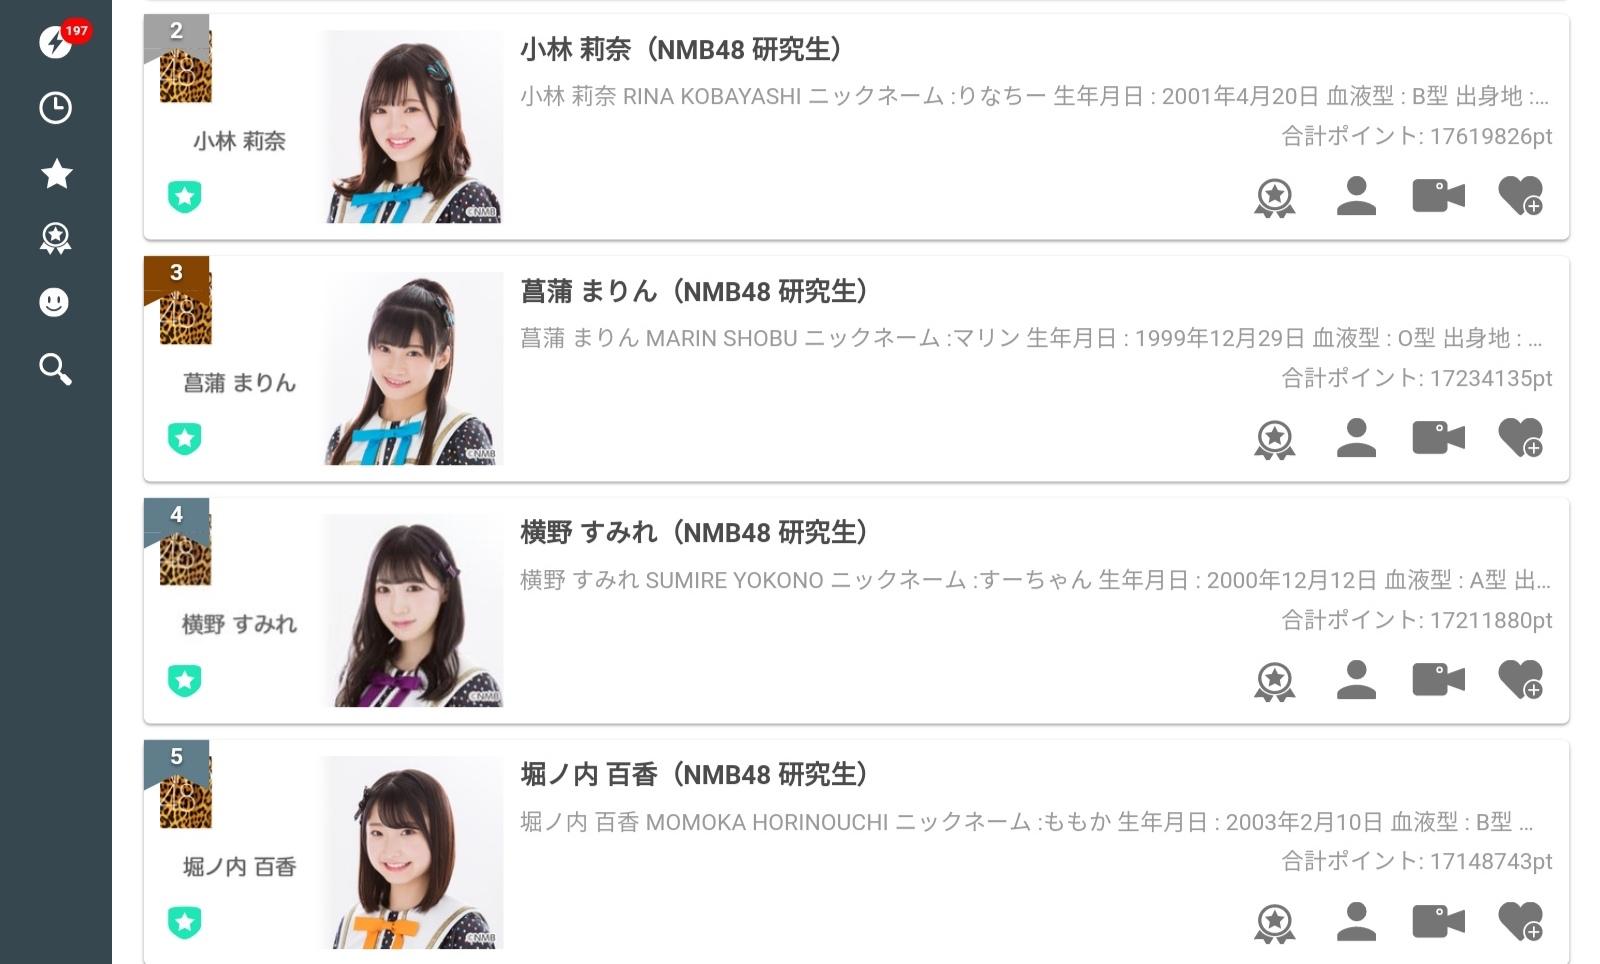 【NMB48】SHOWROOM・Popteen誌面出演権争奪イベントの最終結果が確定